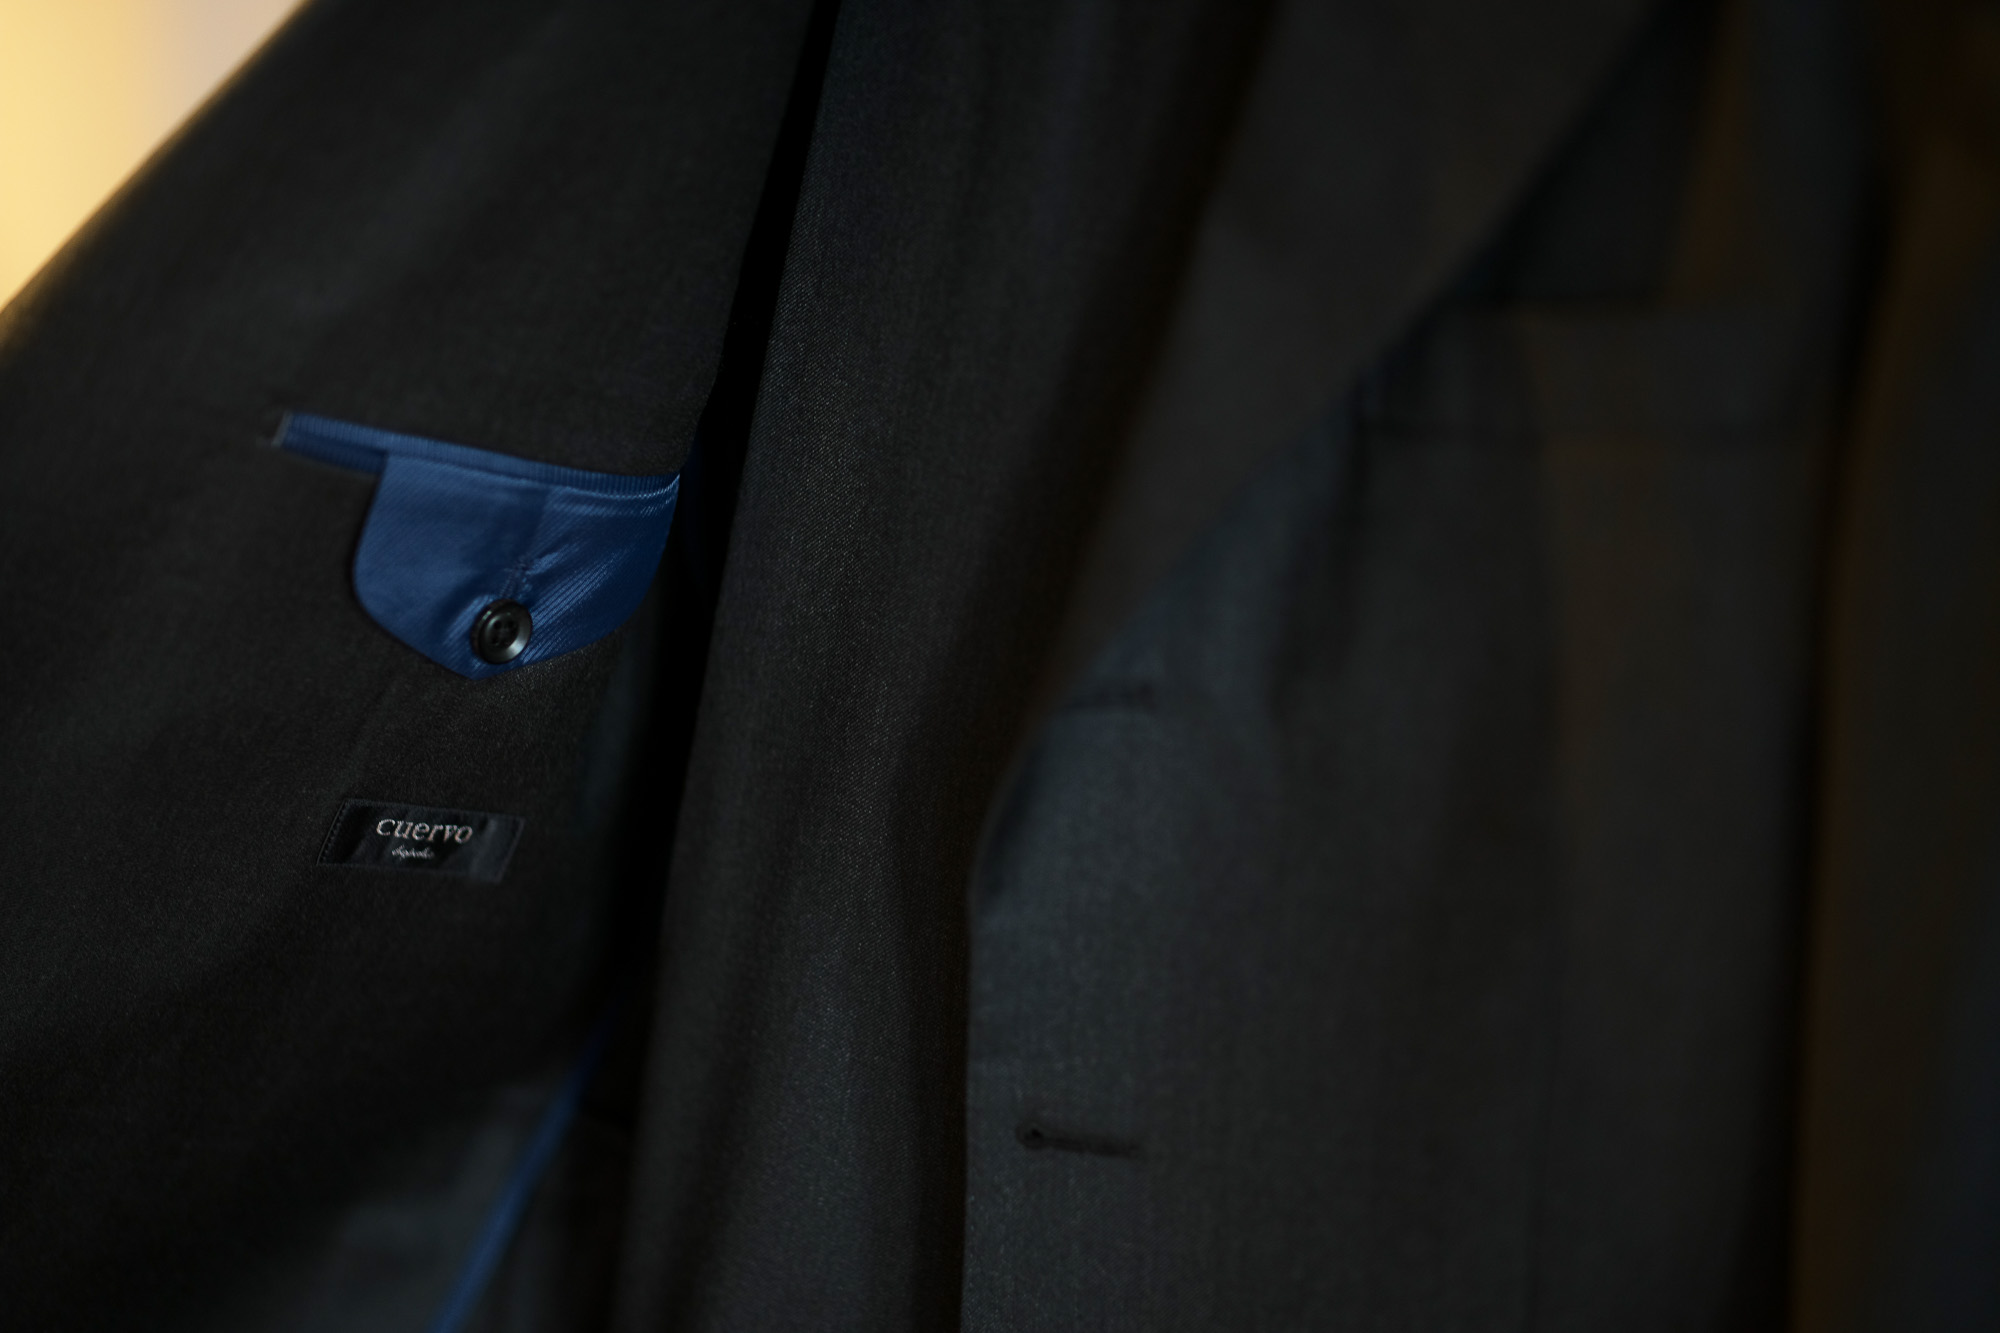 Cuervo (クエルボ) Sartoria Collection (サルトリア コレクション) Rooster (ルースター) LoroPiana (ロロピアーナ) FOUR SEASONS スーツ CHACOAL GRAY (チャコールグレー) MADE IN JAPAN (日本製) 2019 秋冬【オーダー分入荷】 愛知 名古屋 alto e diritto アルトエデリット